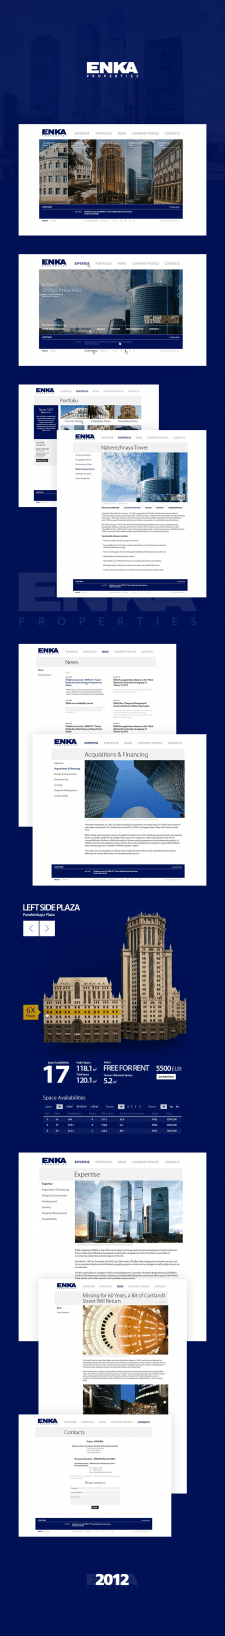 ENKA Properties